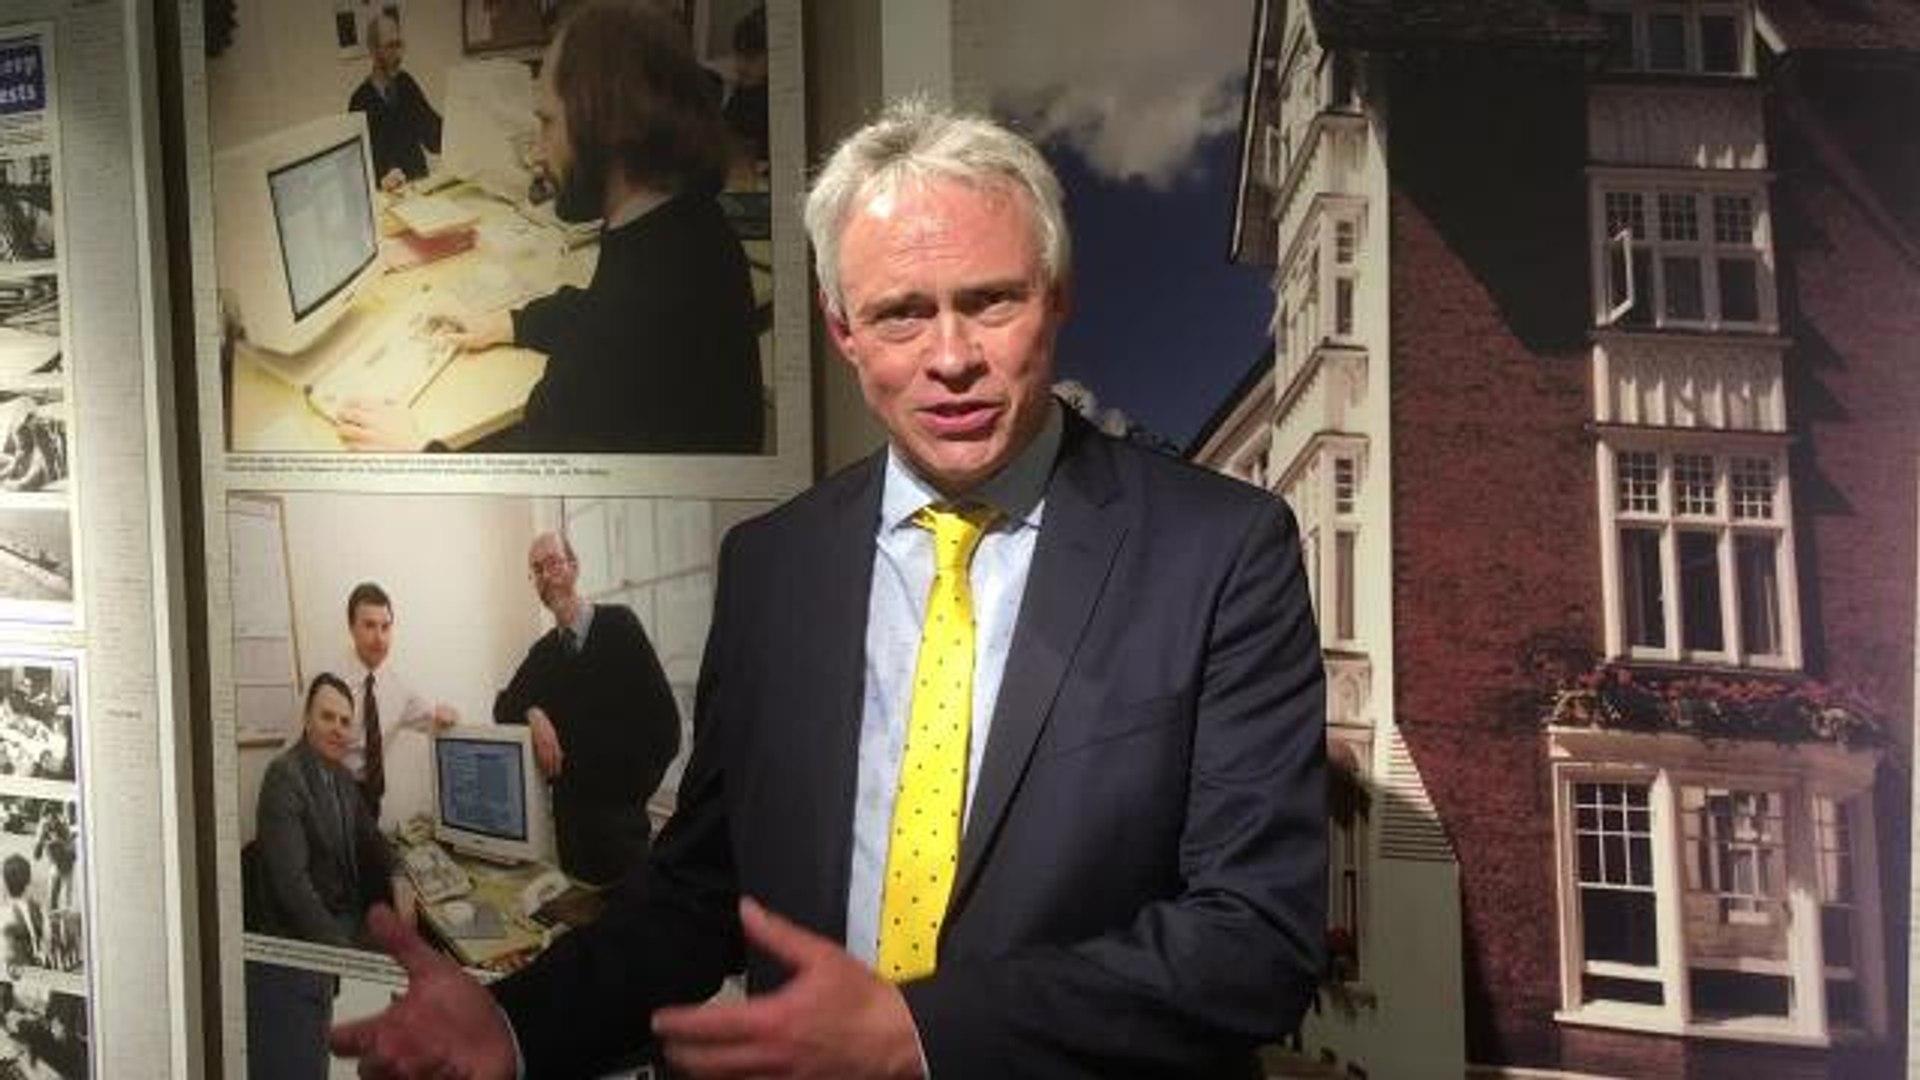 Watch editor Gary Shipton relive the Horsham royal visit